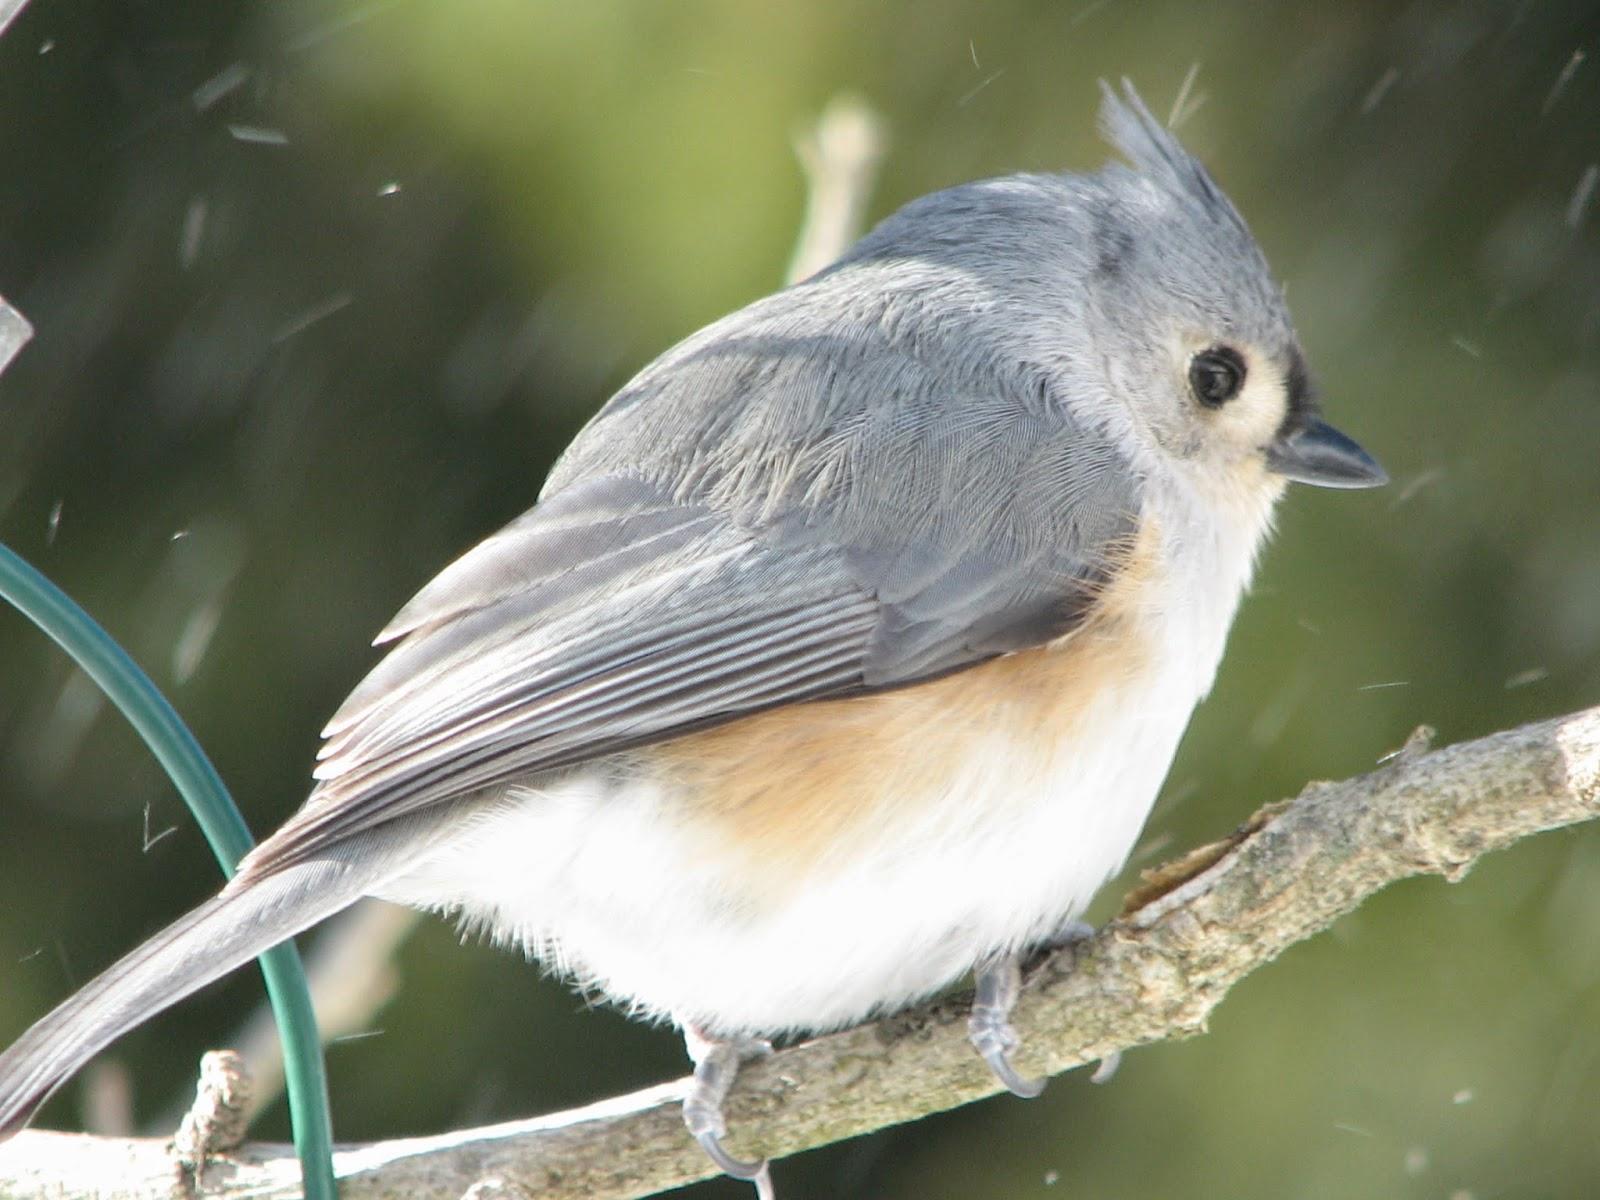 south burlington birds tufted titmouse photos south burlington